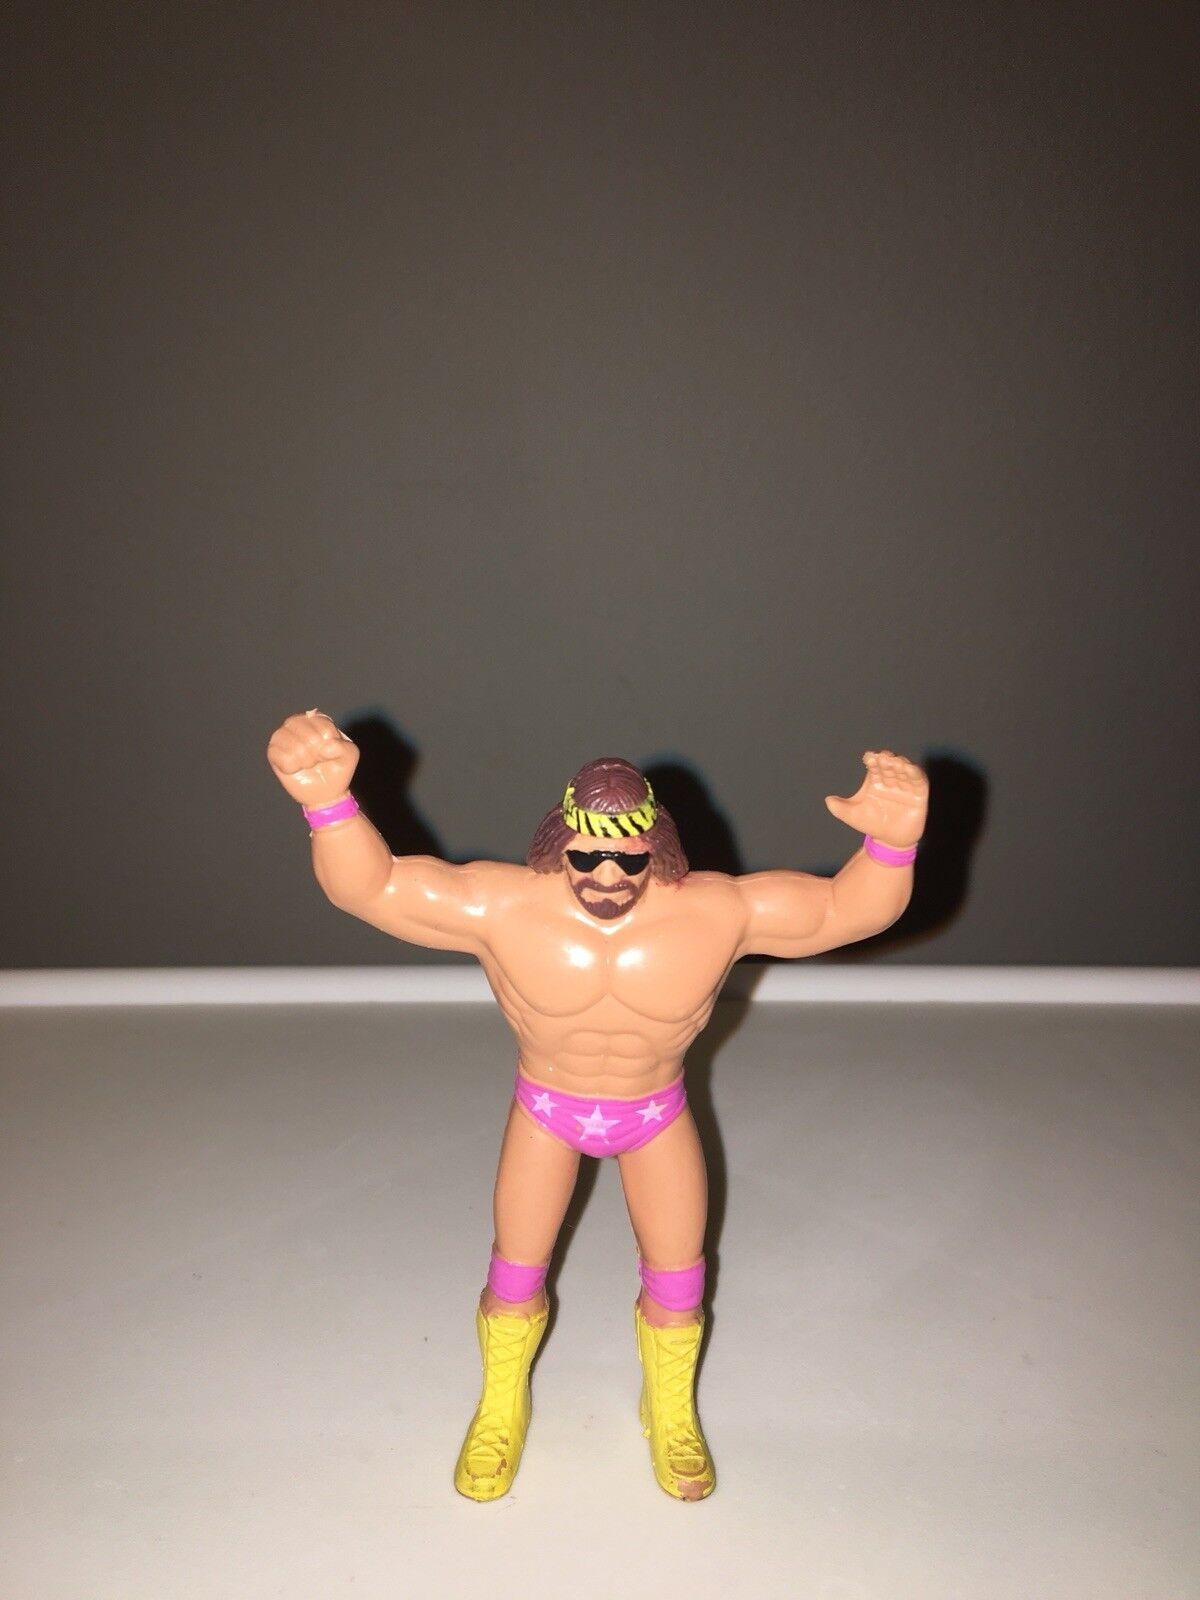 Macho Man 4 Inch Bendie WWF LJN